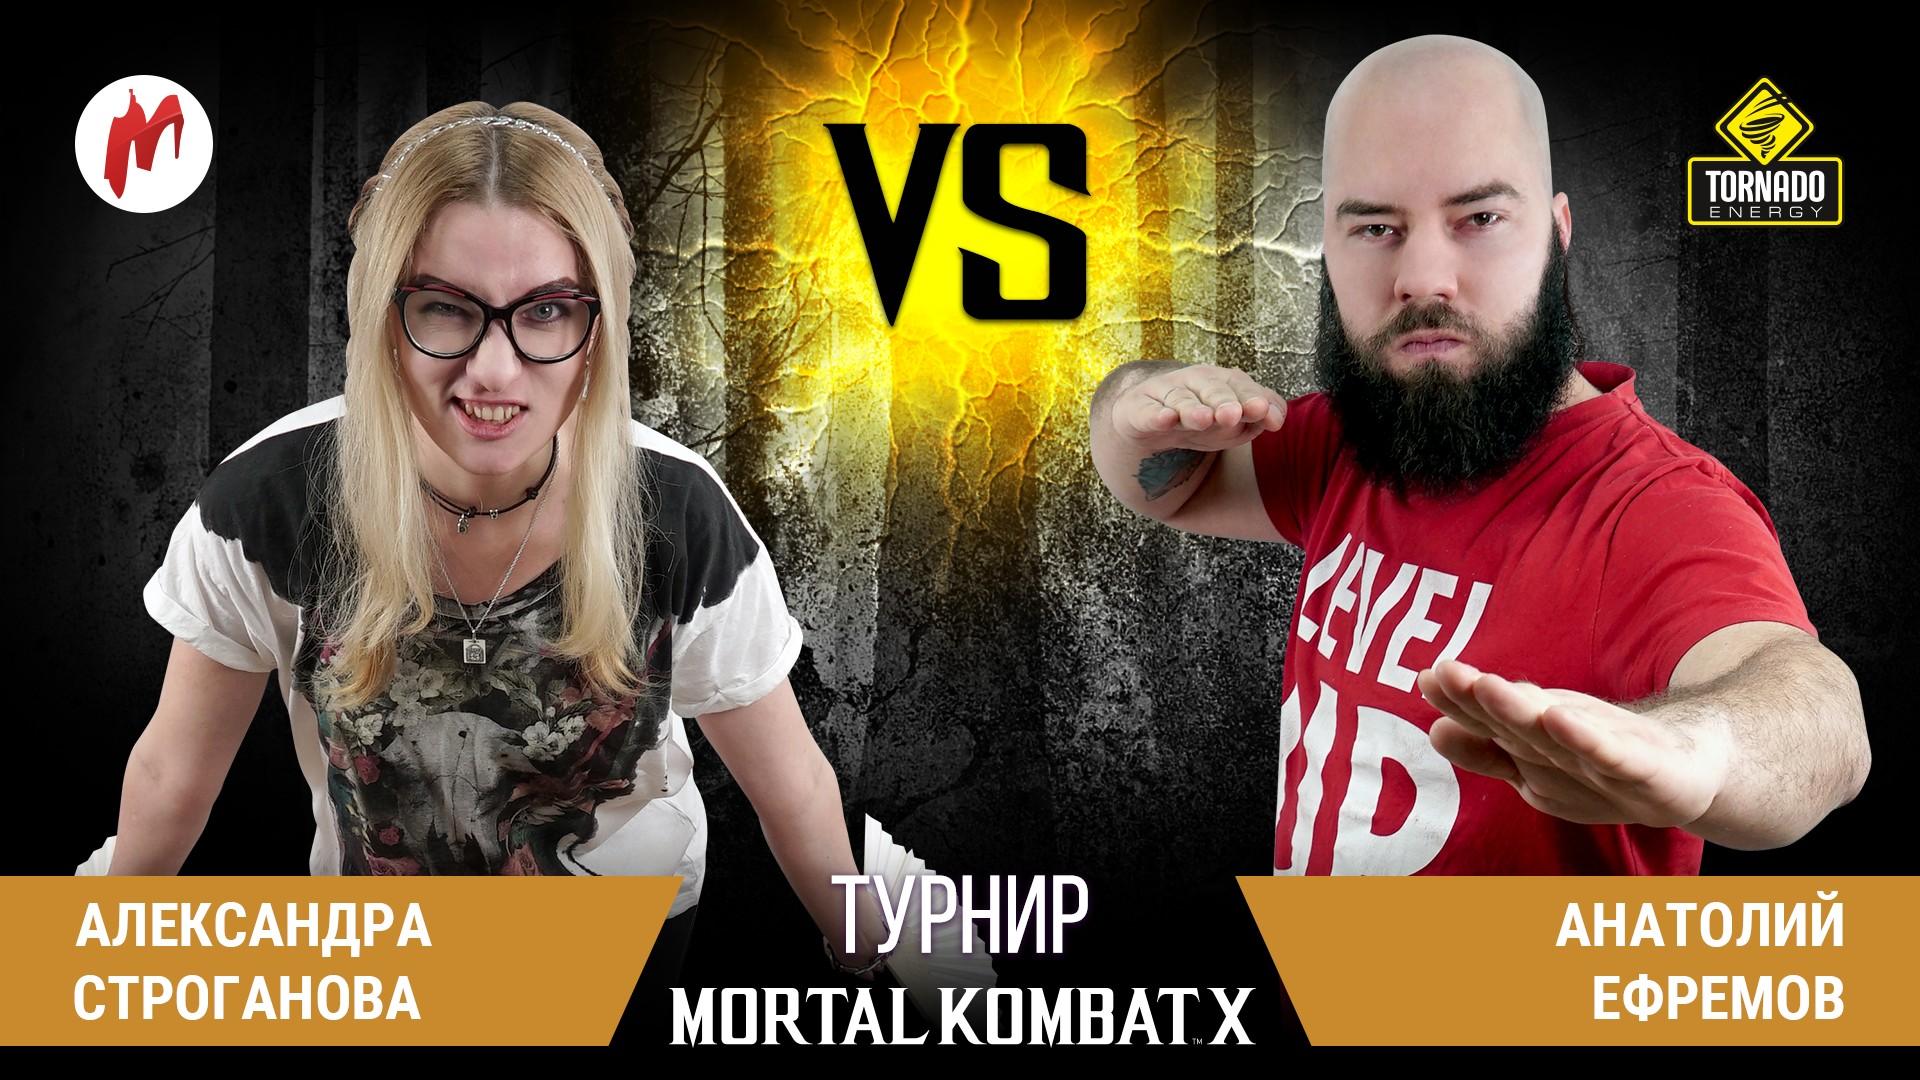 Турнир Игромании по Mortal Kombat X! Финал: Александра Строганова vs.Анатолий Ефремов